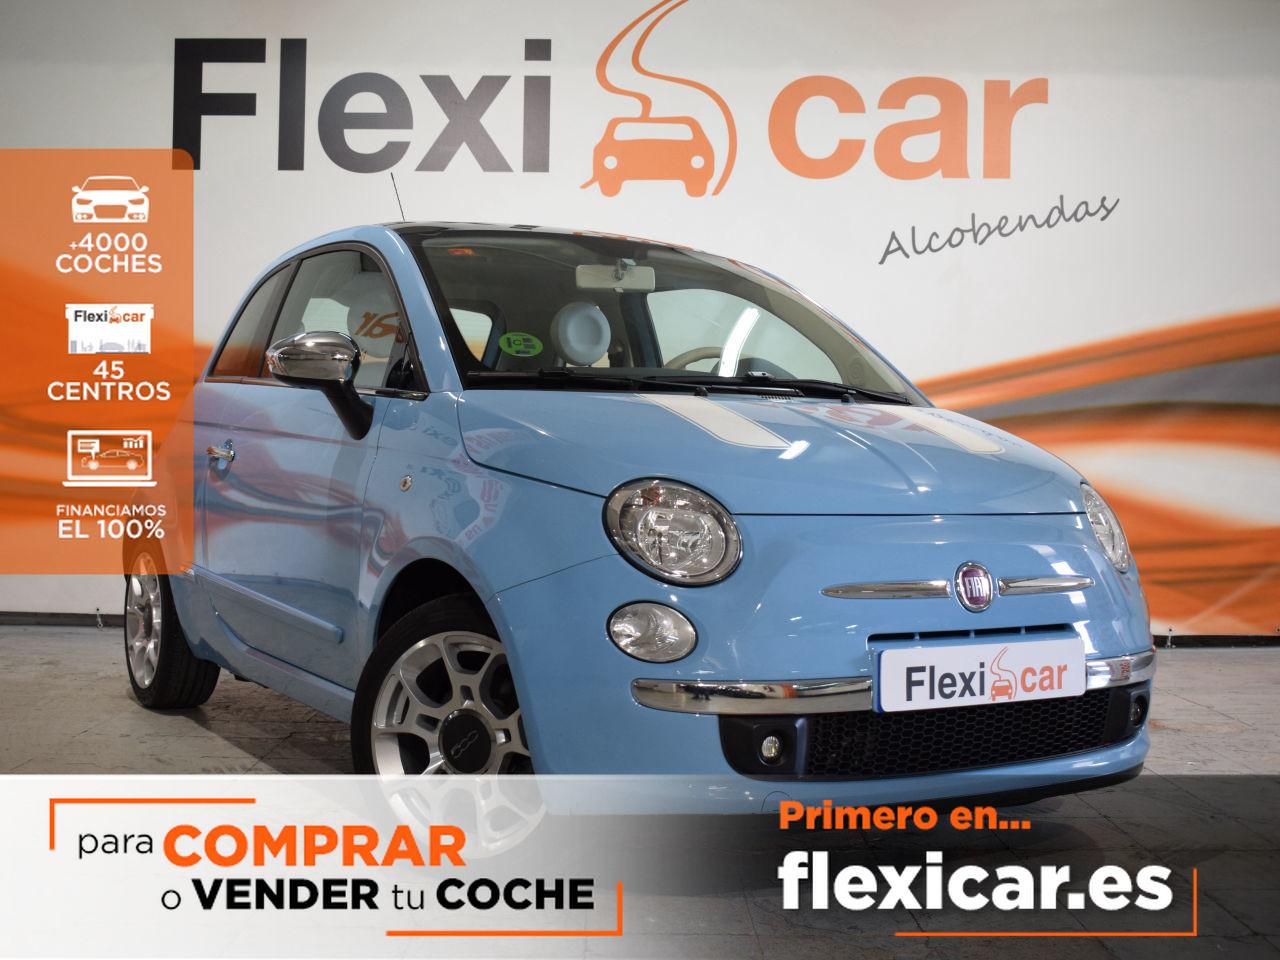 Fiat 500 ocasión segunda mano 2011 Gasolina por 8.990€ en Madrid